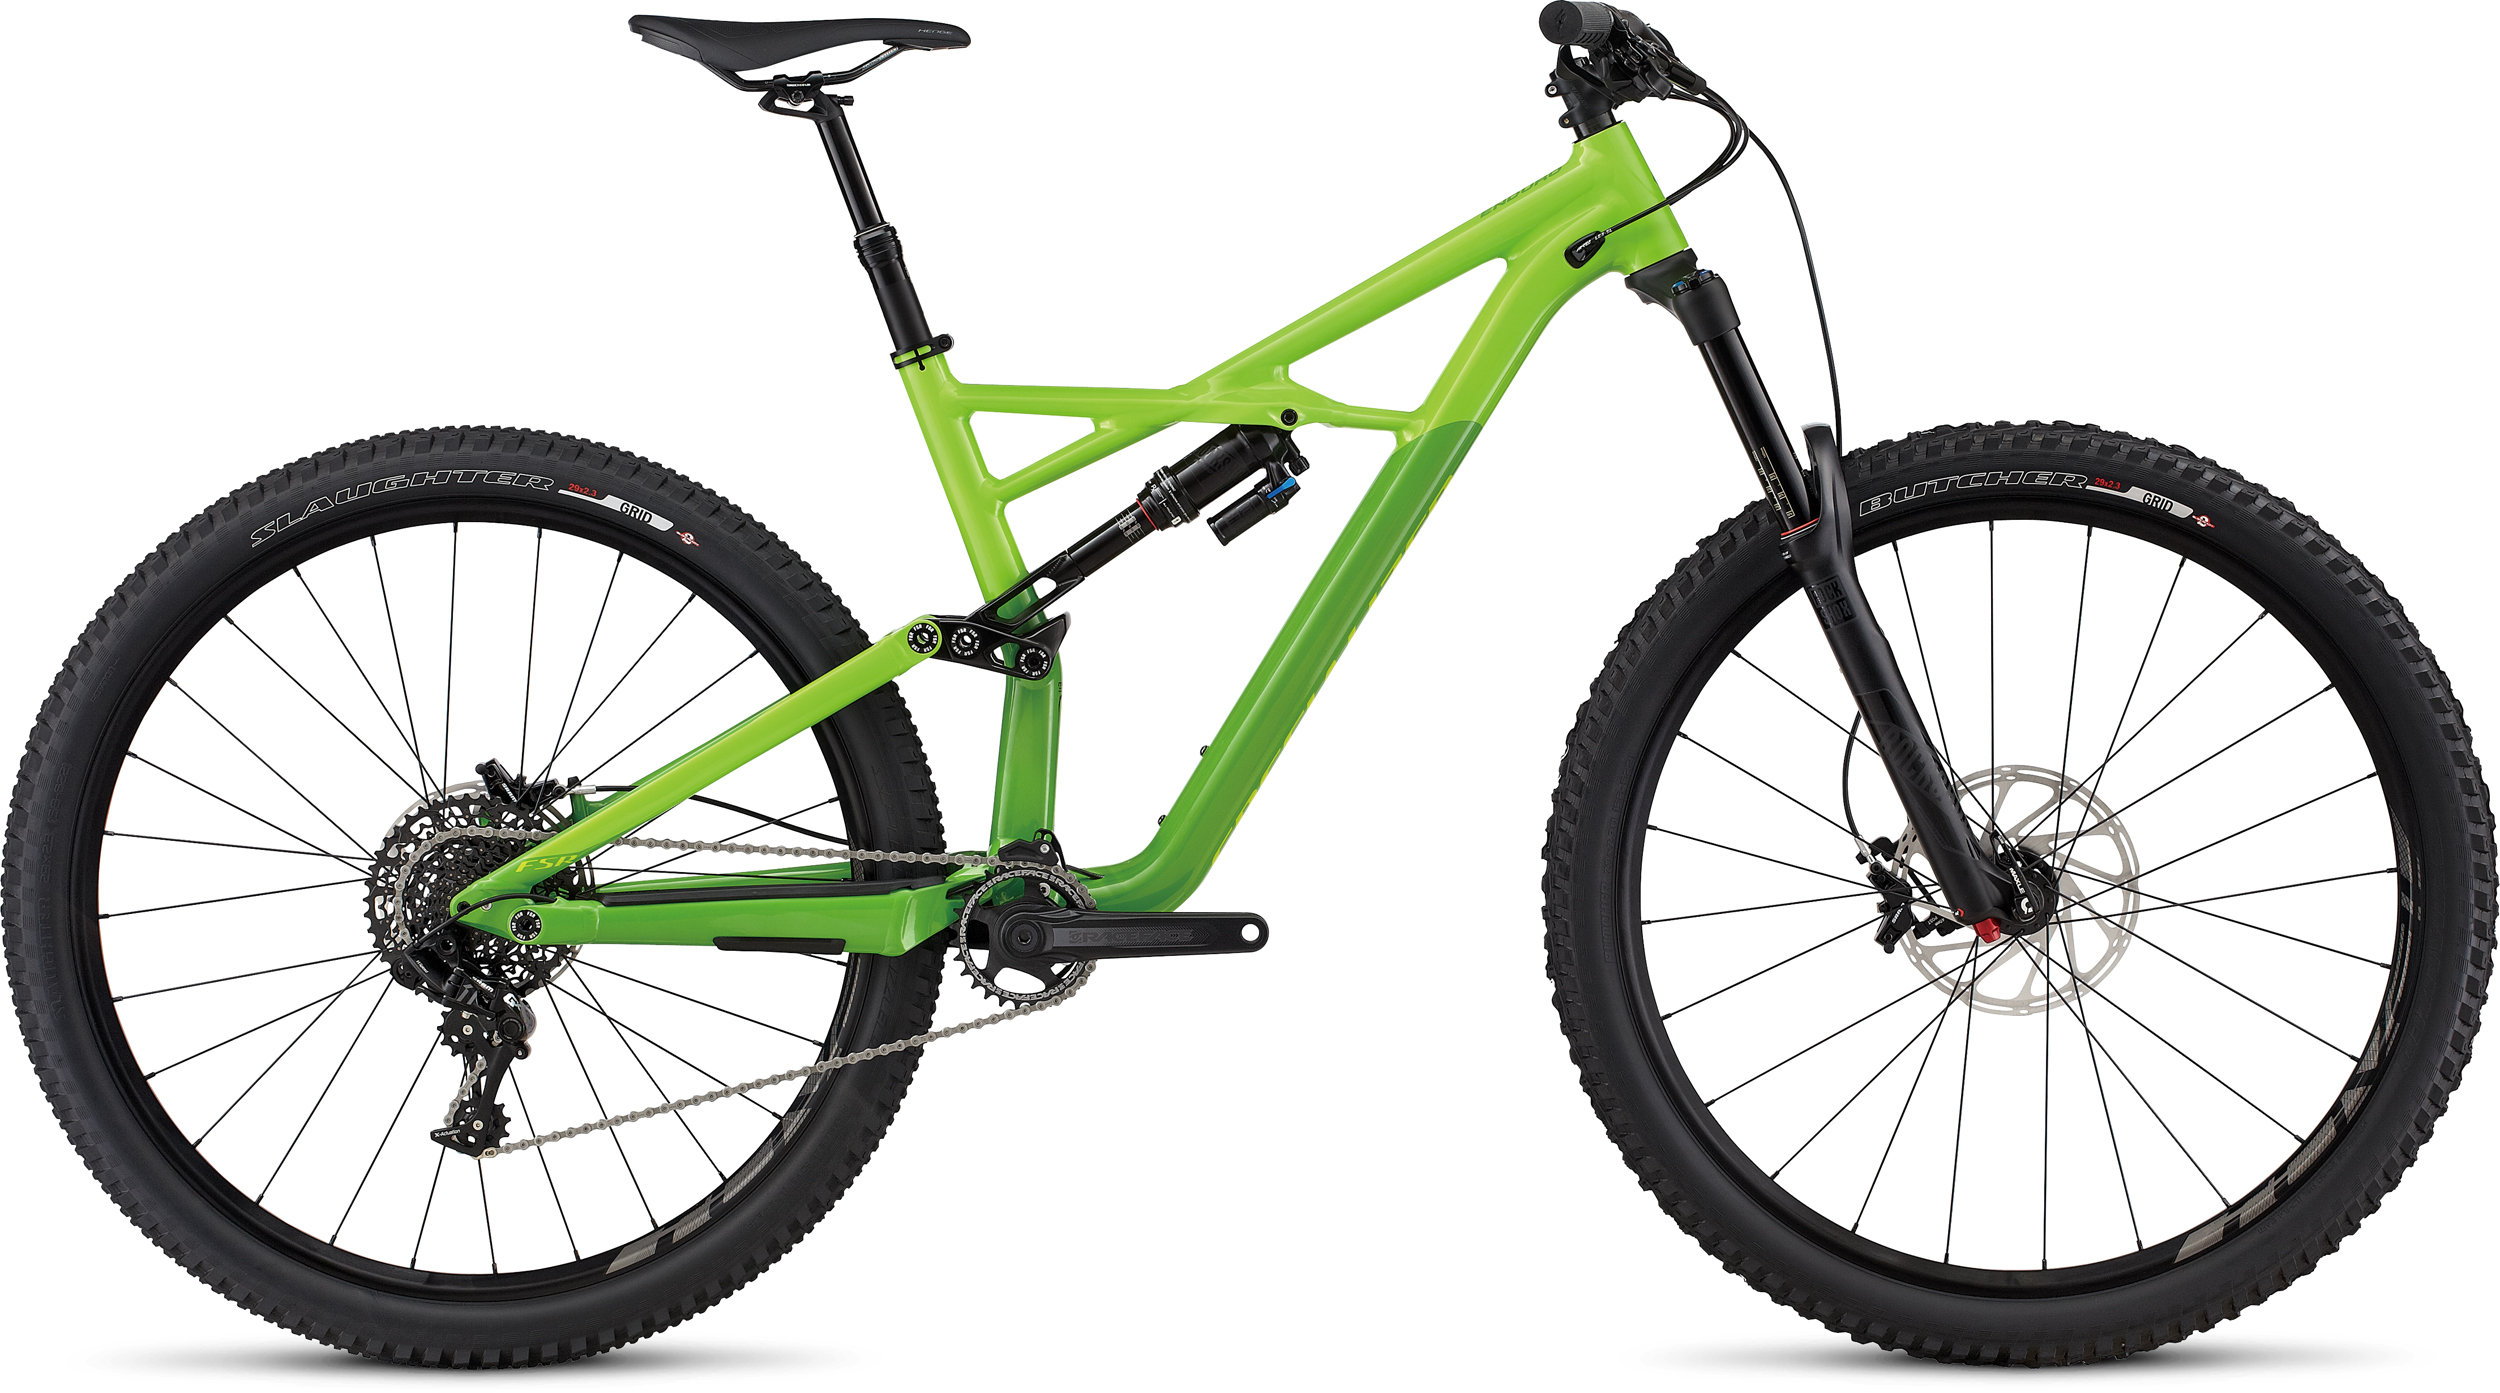 SPECIALIZED ENDURO FSR COMP 29/6FATTIE MXGRN/MONGRN/HYP L - Bike Zone